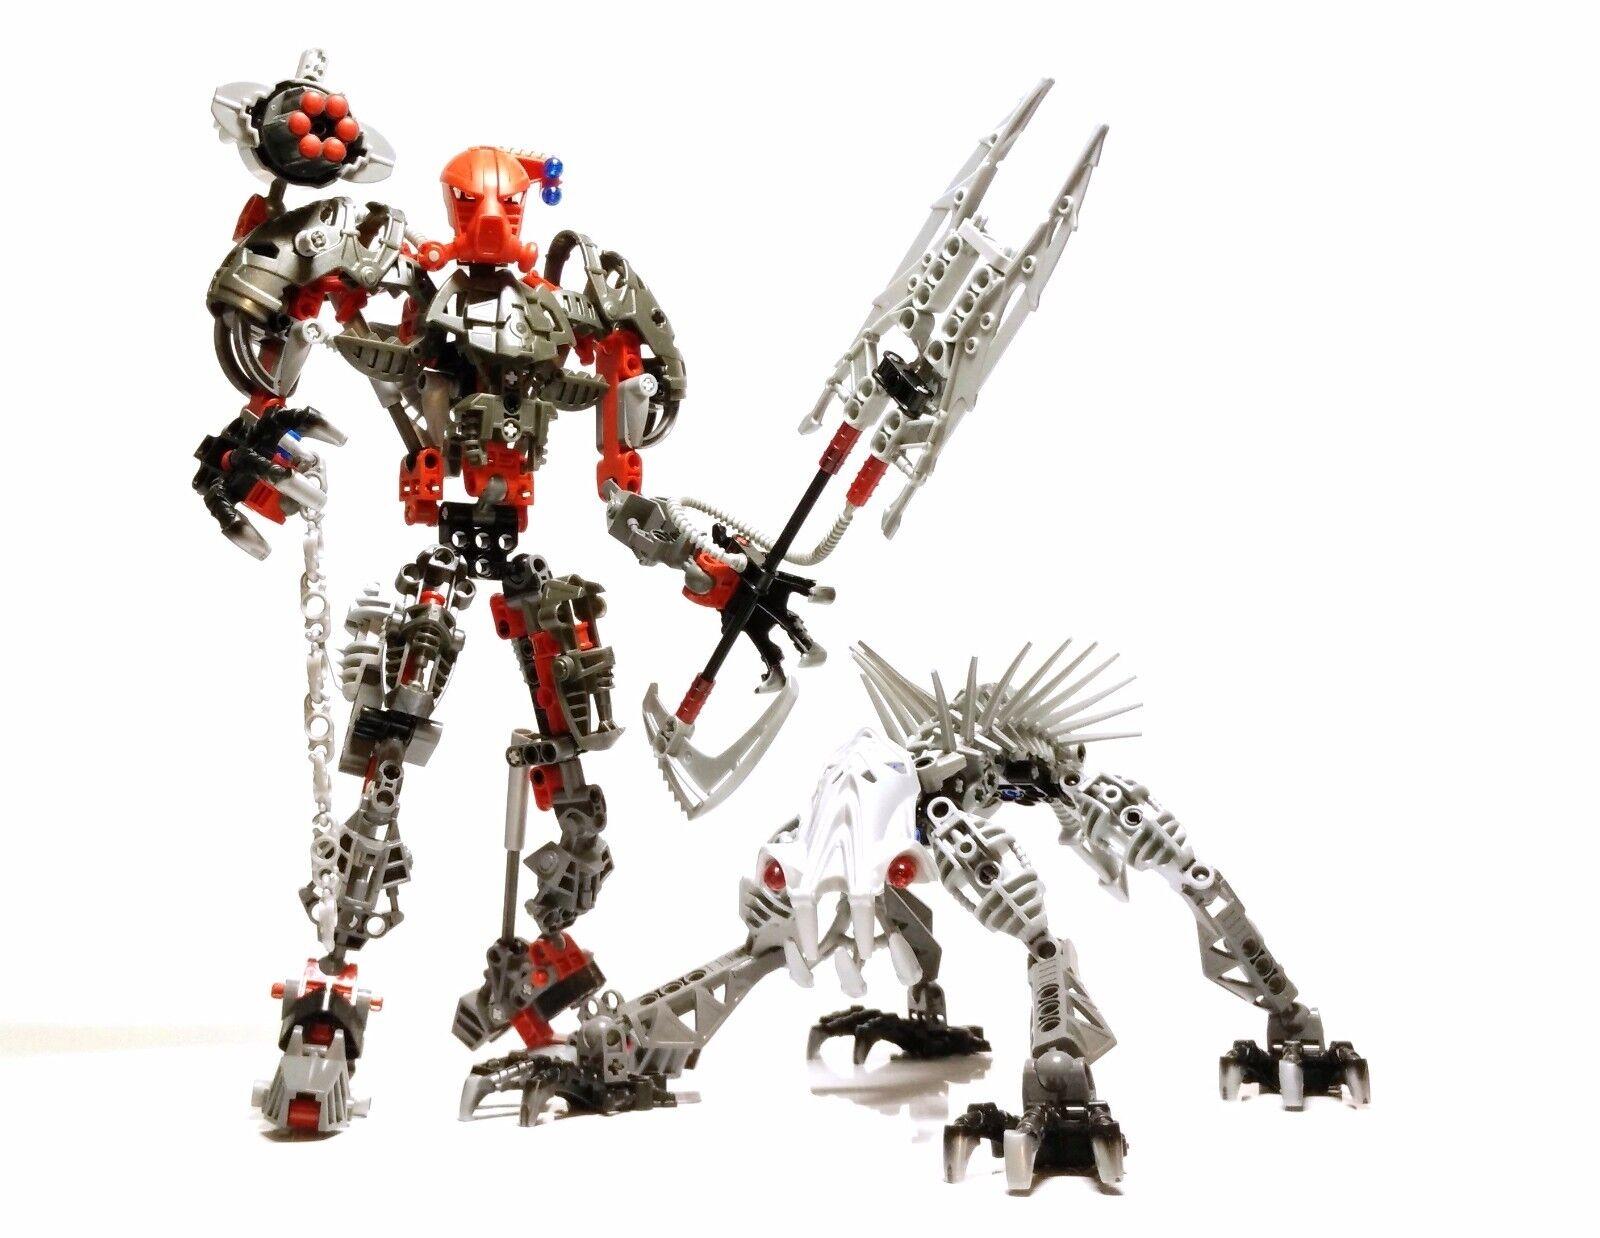 LEGO LEGO LEGO Bionicle Warriors 8924  Maxilos and Spinax 8b1462